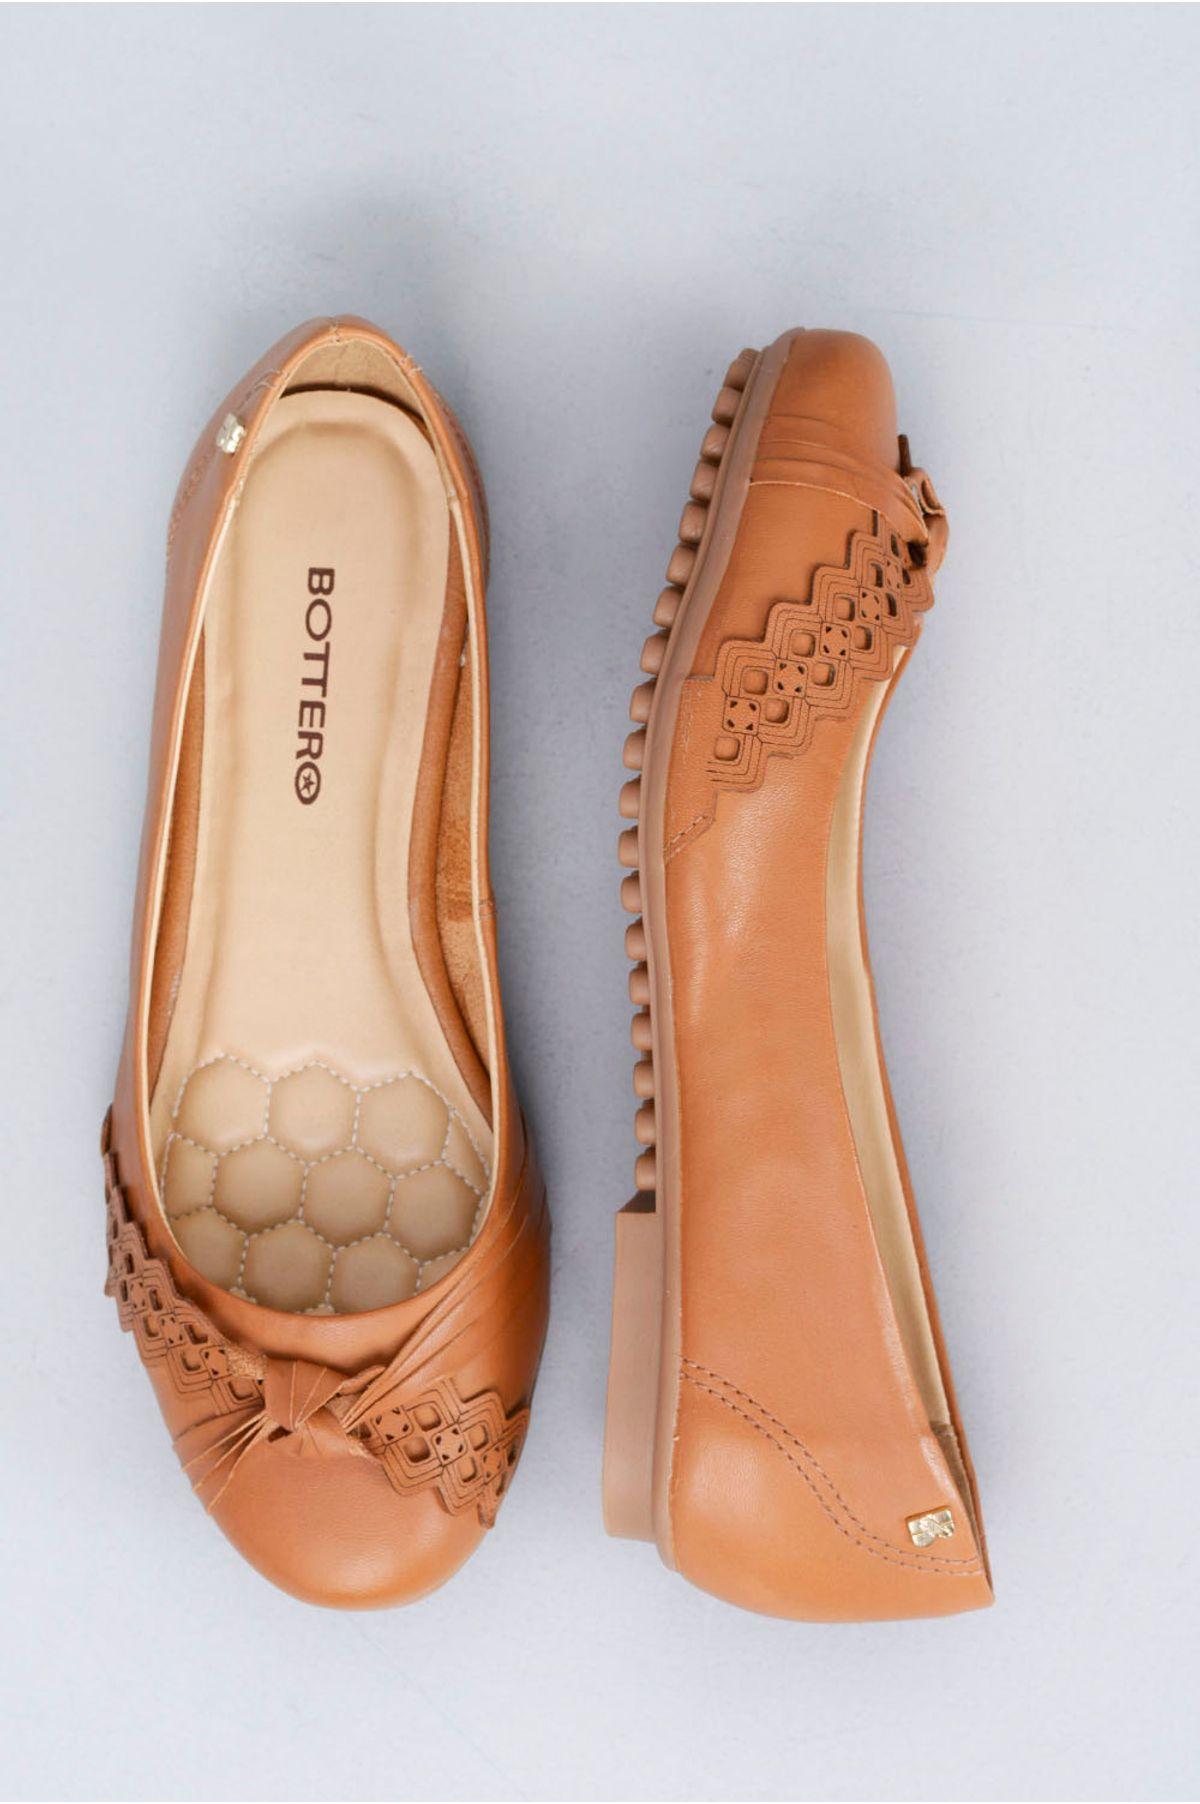 ce9ea1dd3b Sapatilha Feminina Aixa Bottero CR-CARAMELO - Mundial Calçados